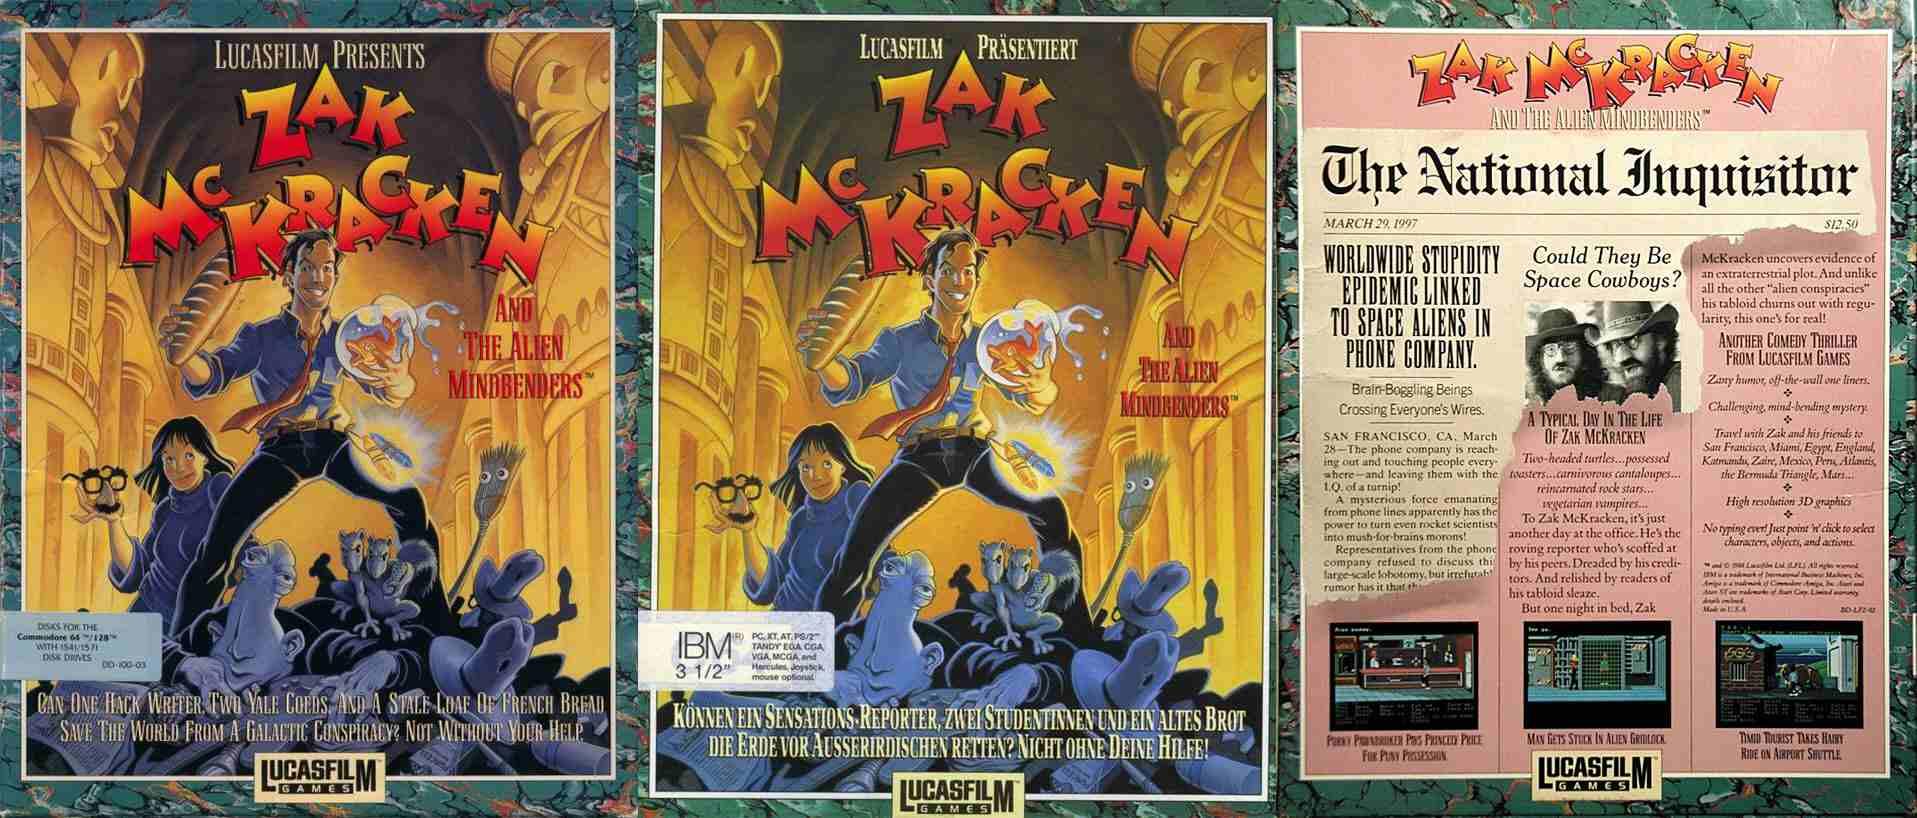 Zak McKracken and The Alien Mindbenders IBM PC, Amiga Box & Back